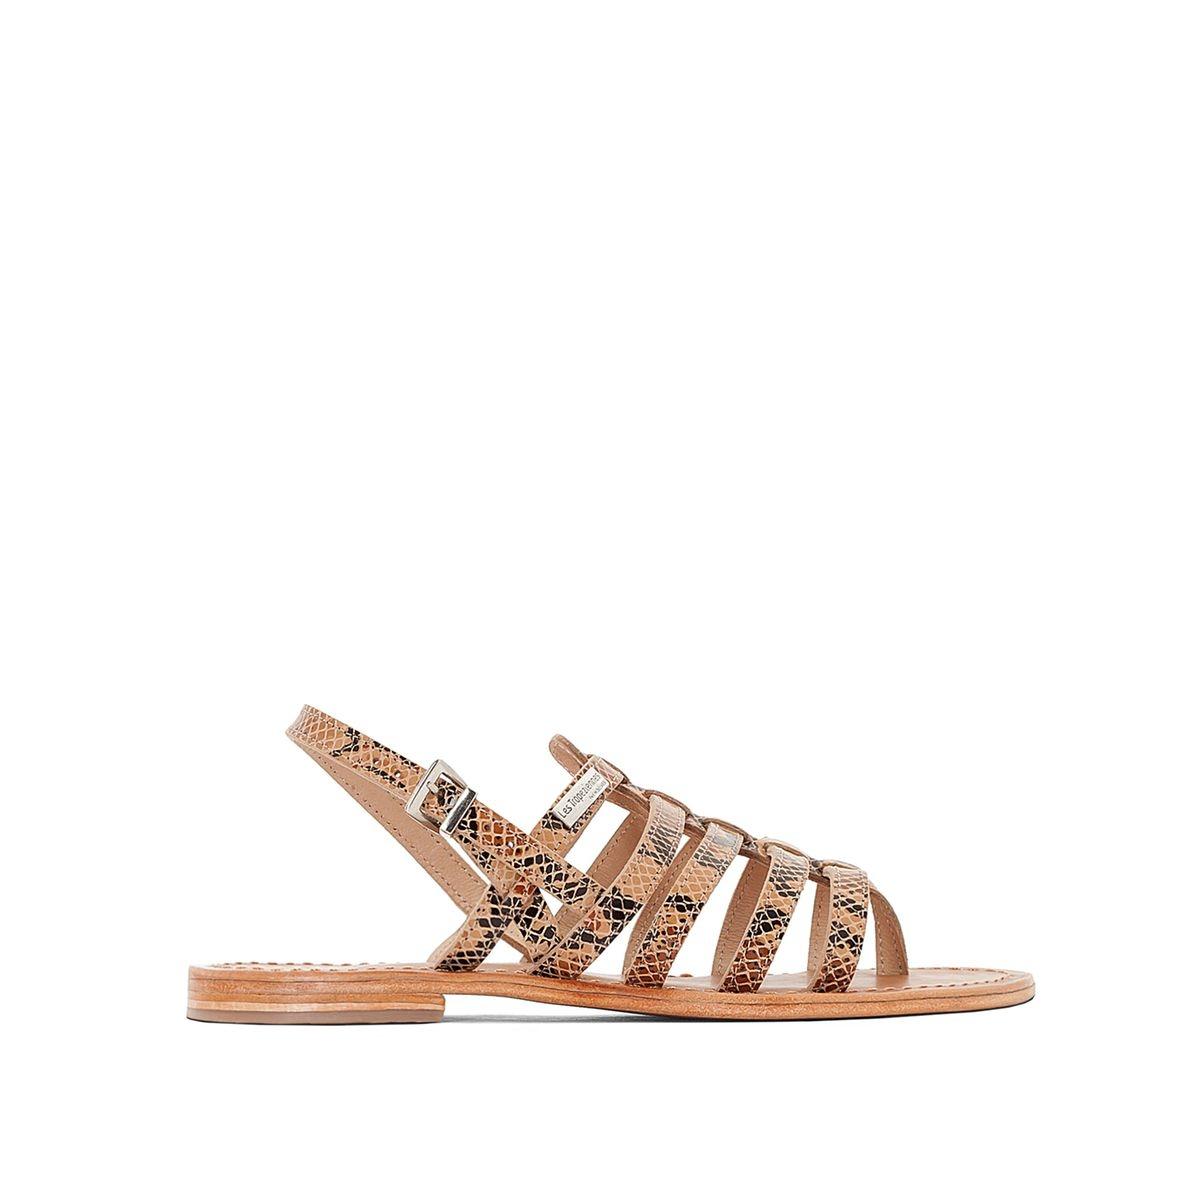 Sandales cuir entre-doigts Herisson